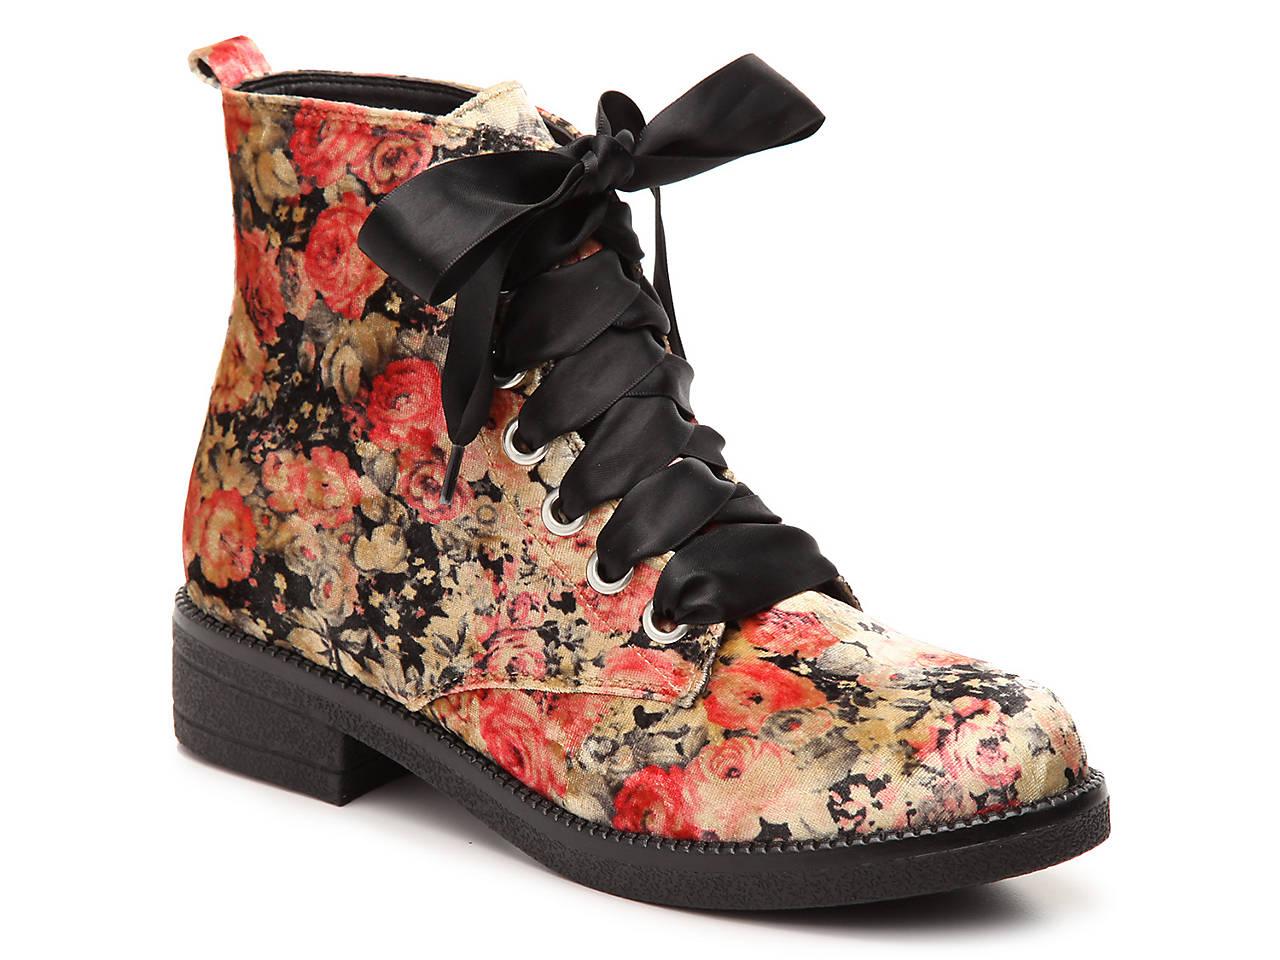 fdece6e3d3cf Dirty Laundry Stefan Velvet Bootie Women s Shoes